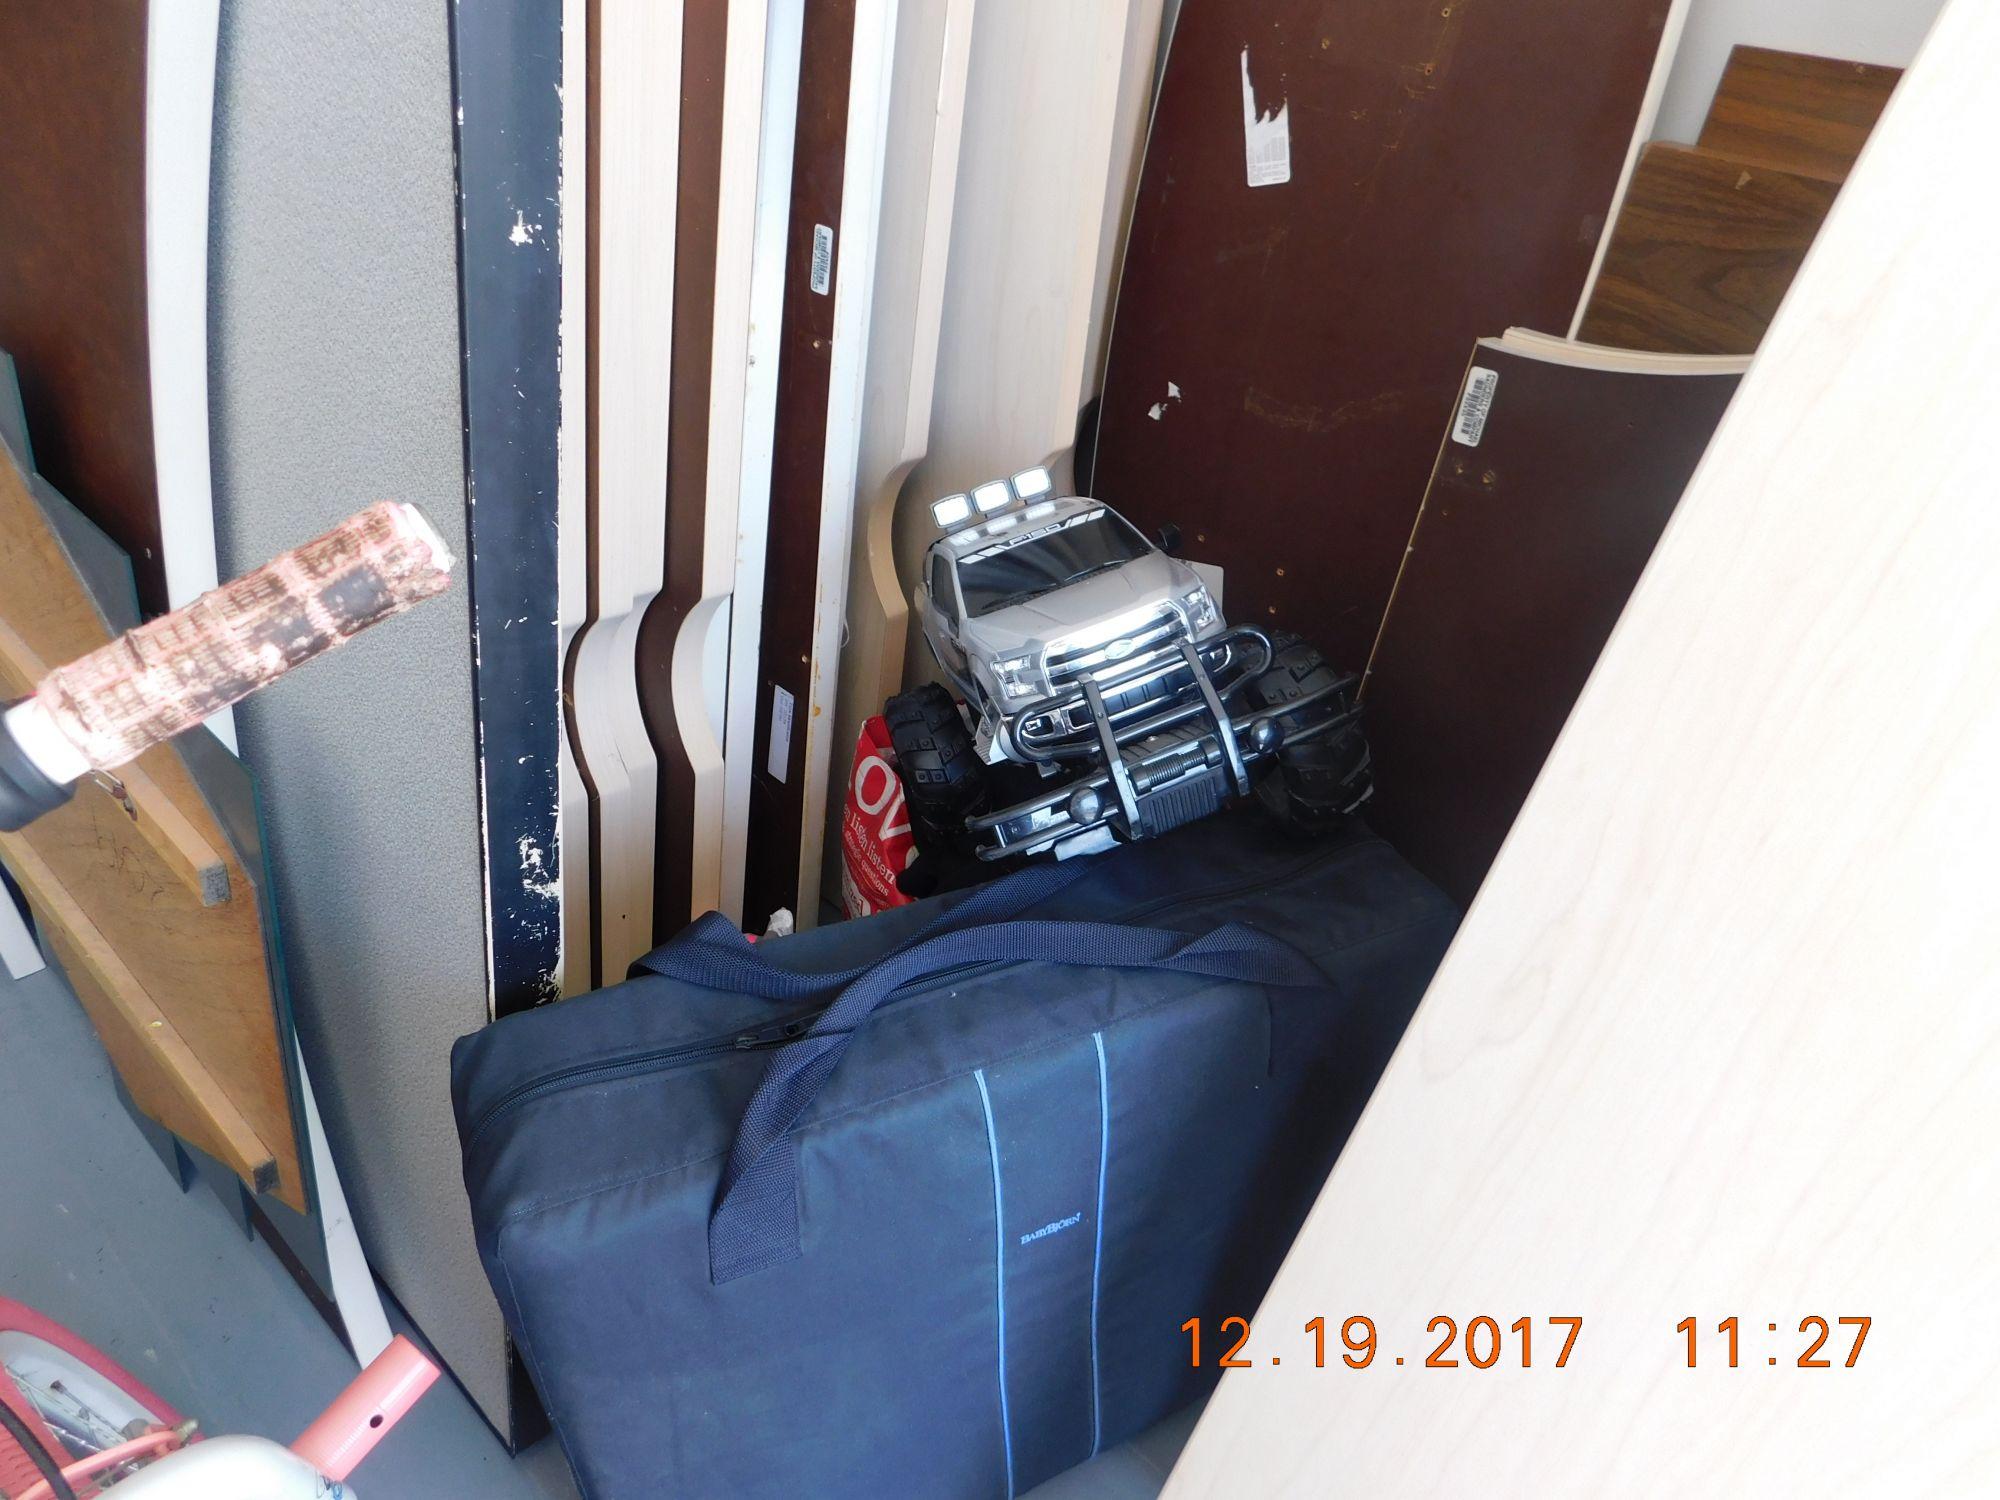 Storage Unit Auction 519165 Sarasota Fl